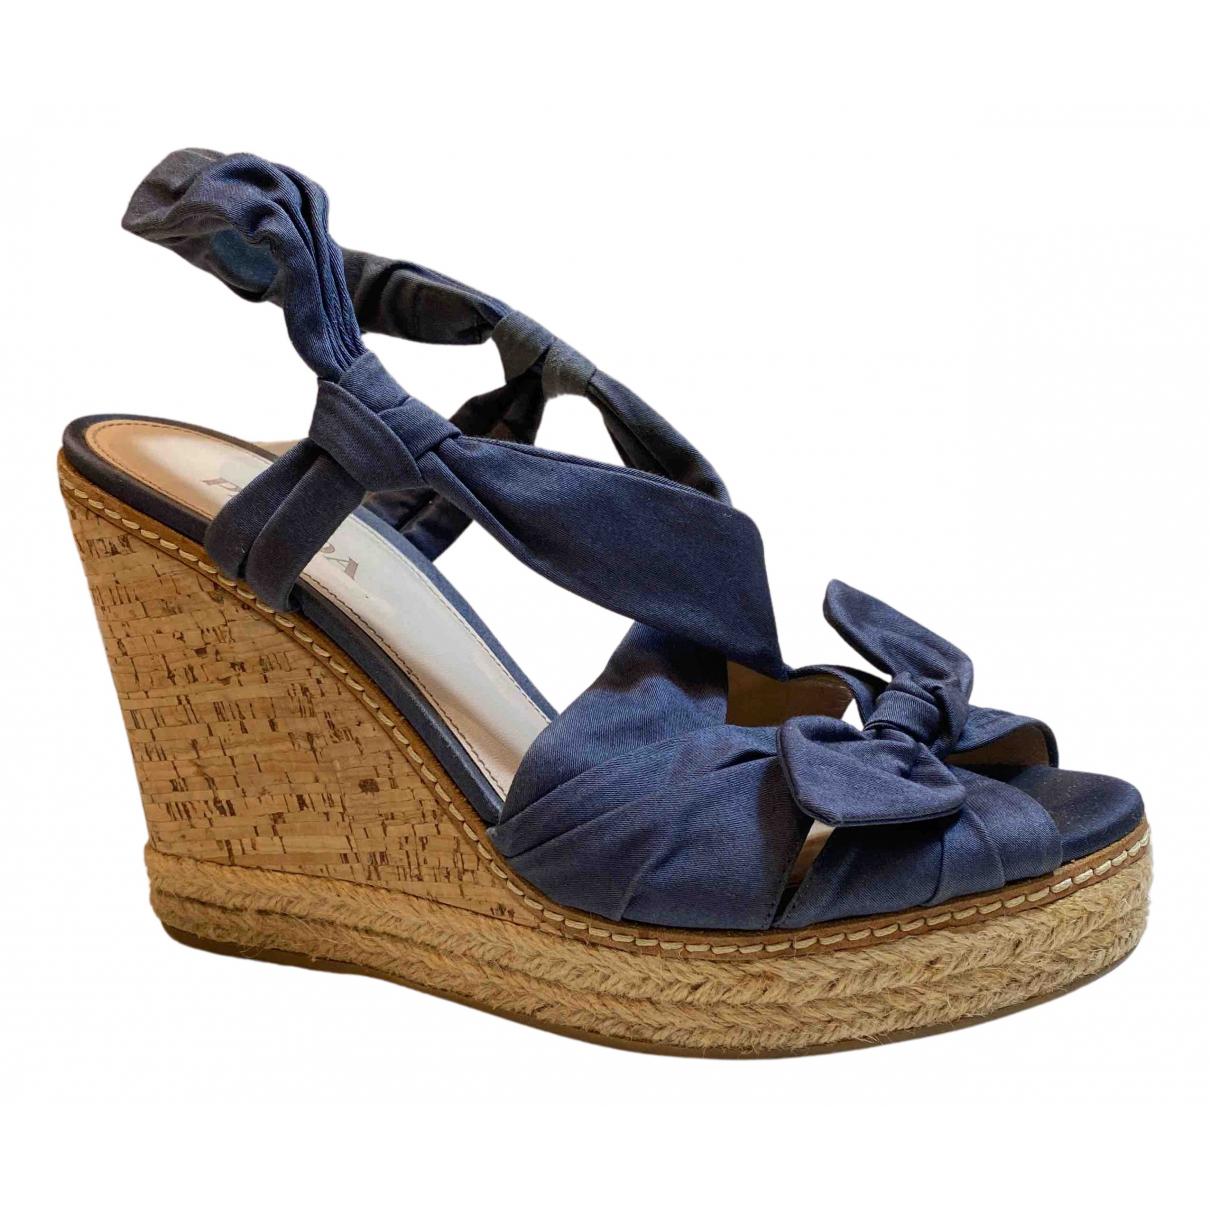 Prada N Blue Cloth Sandals for Women 40 EU